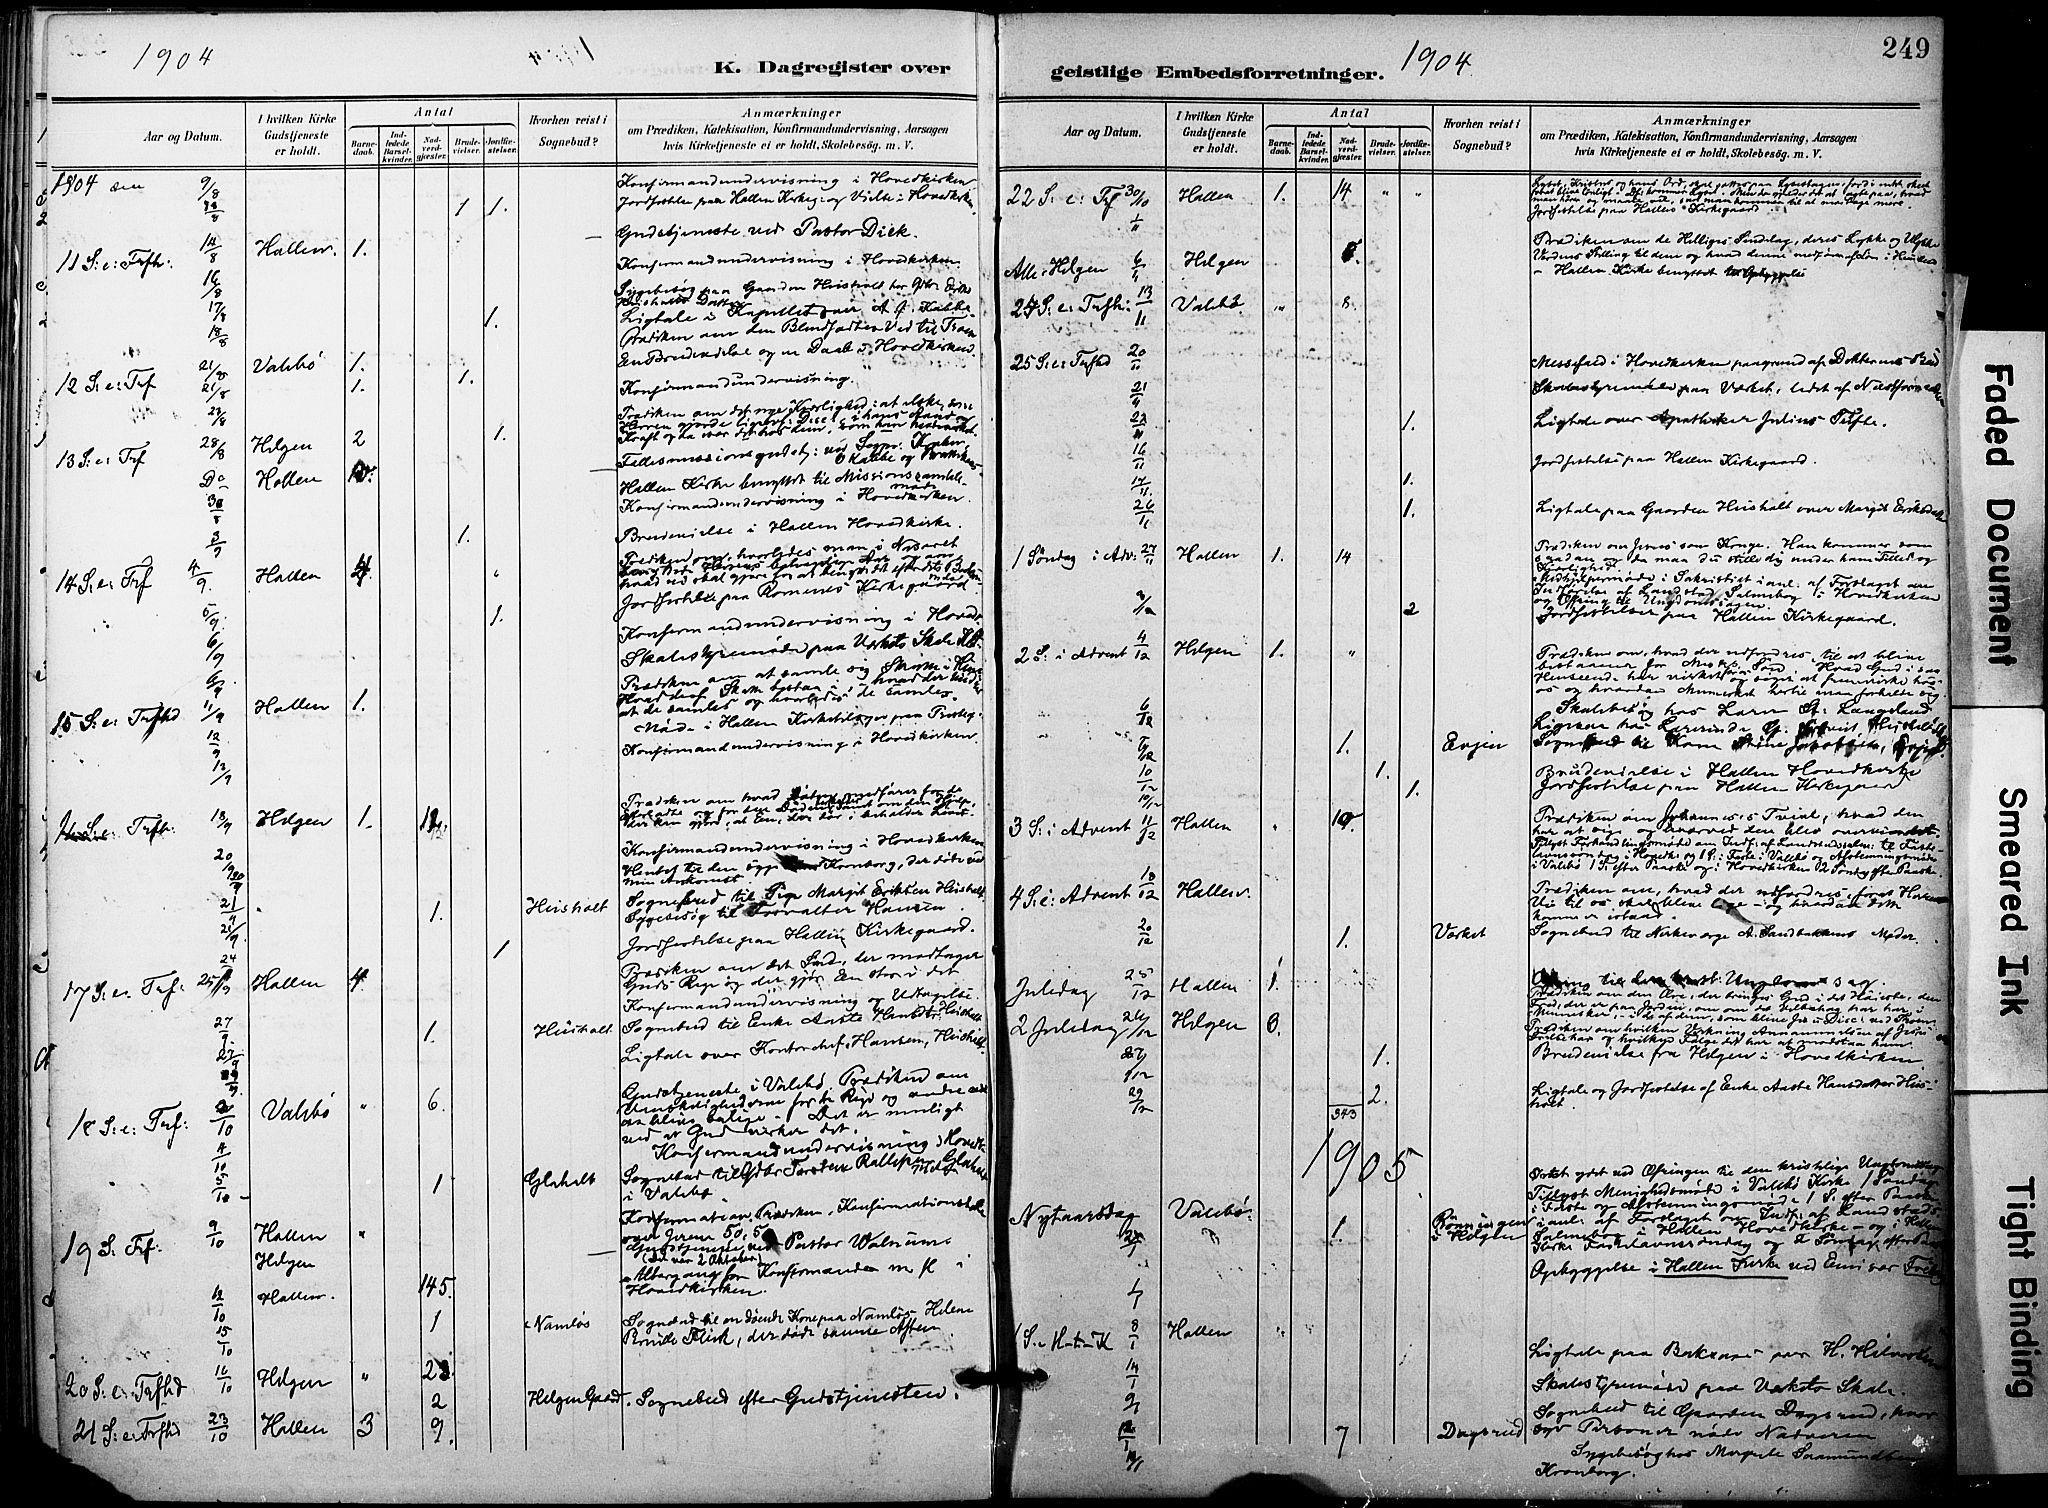 SAKO, Holla kirkebøker, F/Fa/L0010: Ministerialbok nr. 10, 1897-1907, s. 249